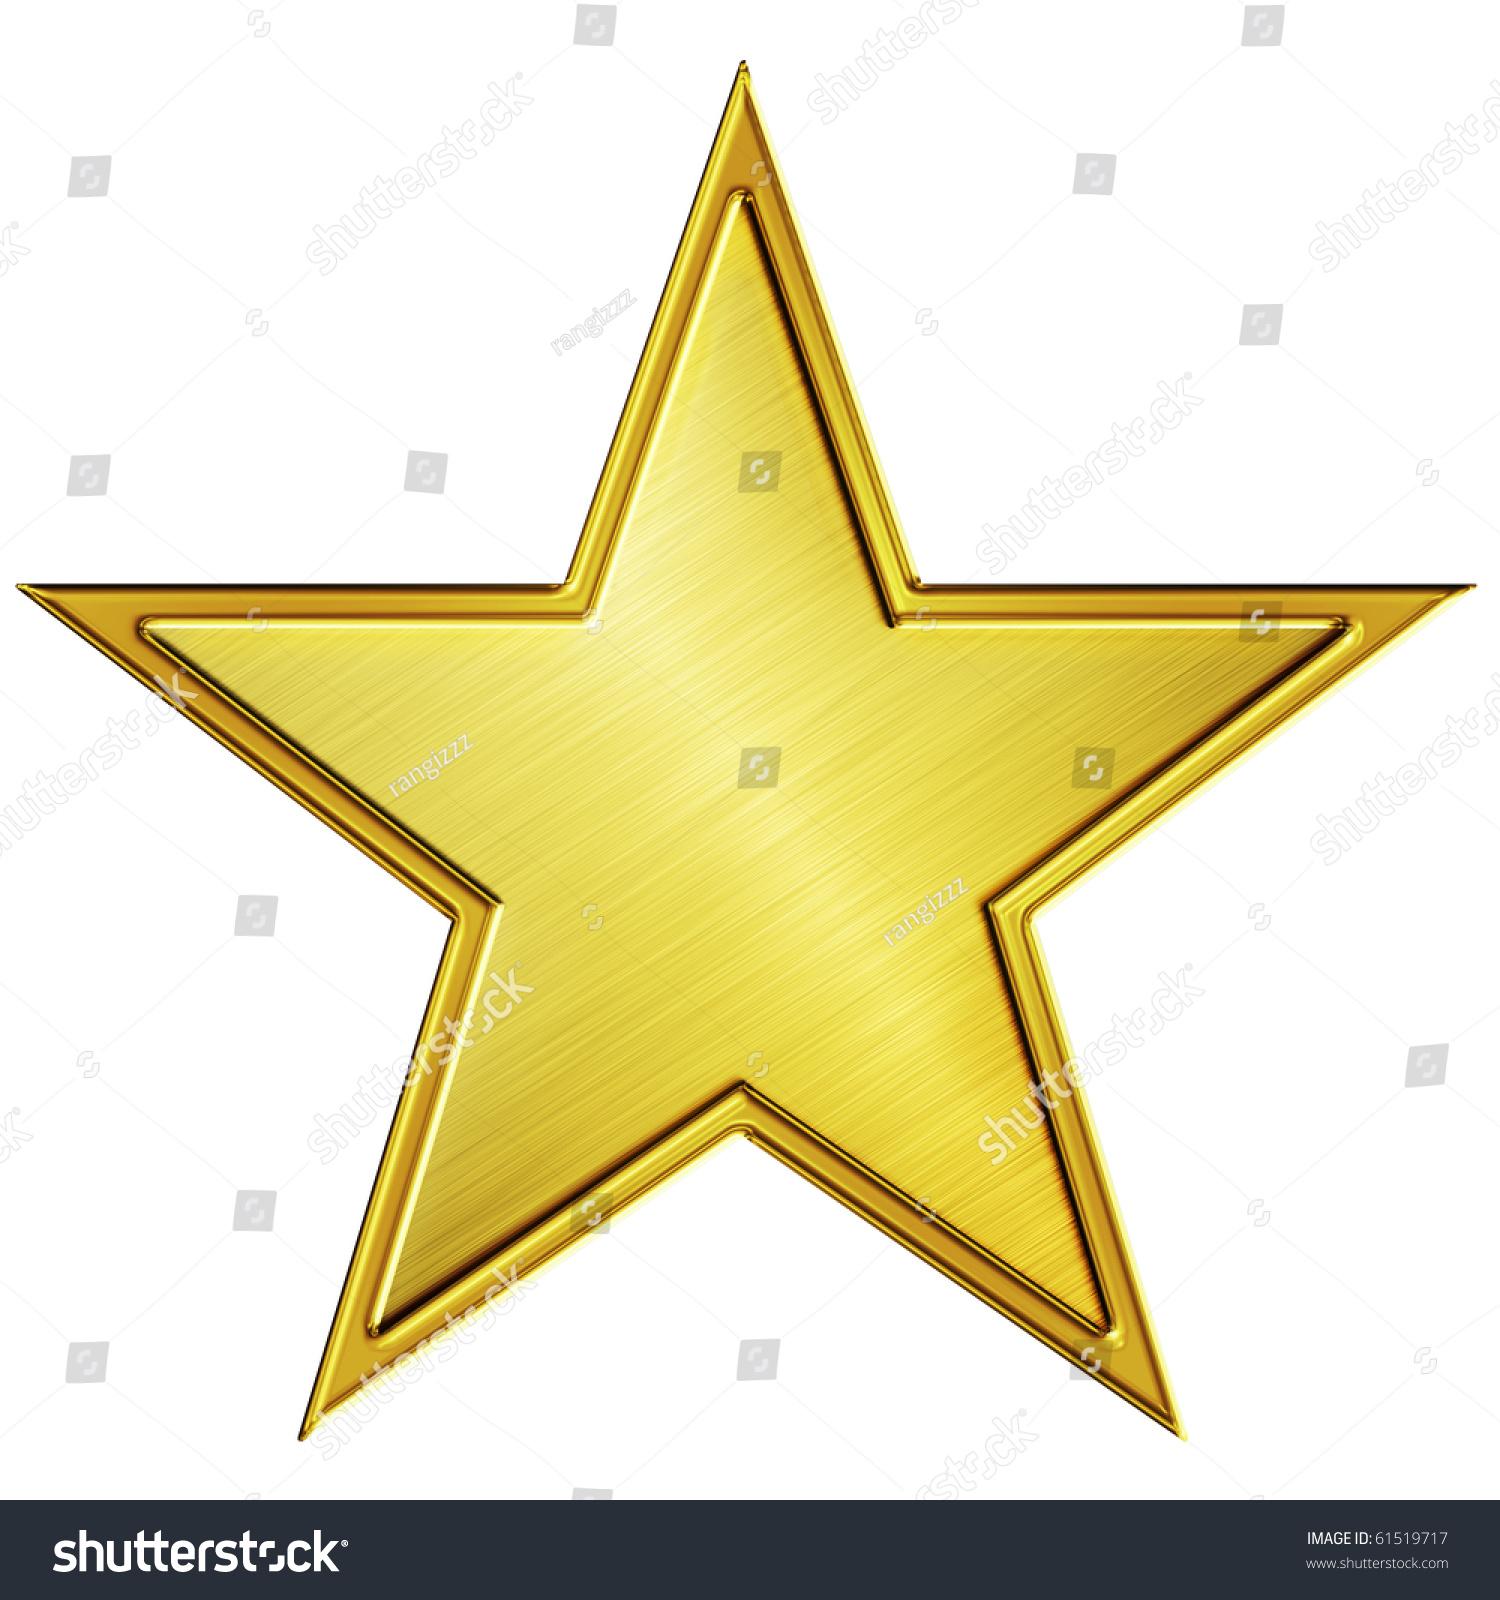 Gold Star Stock Illustration 61519717 - Shutterstock - photo #4